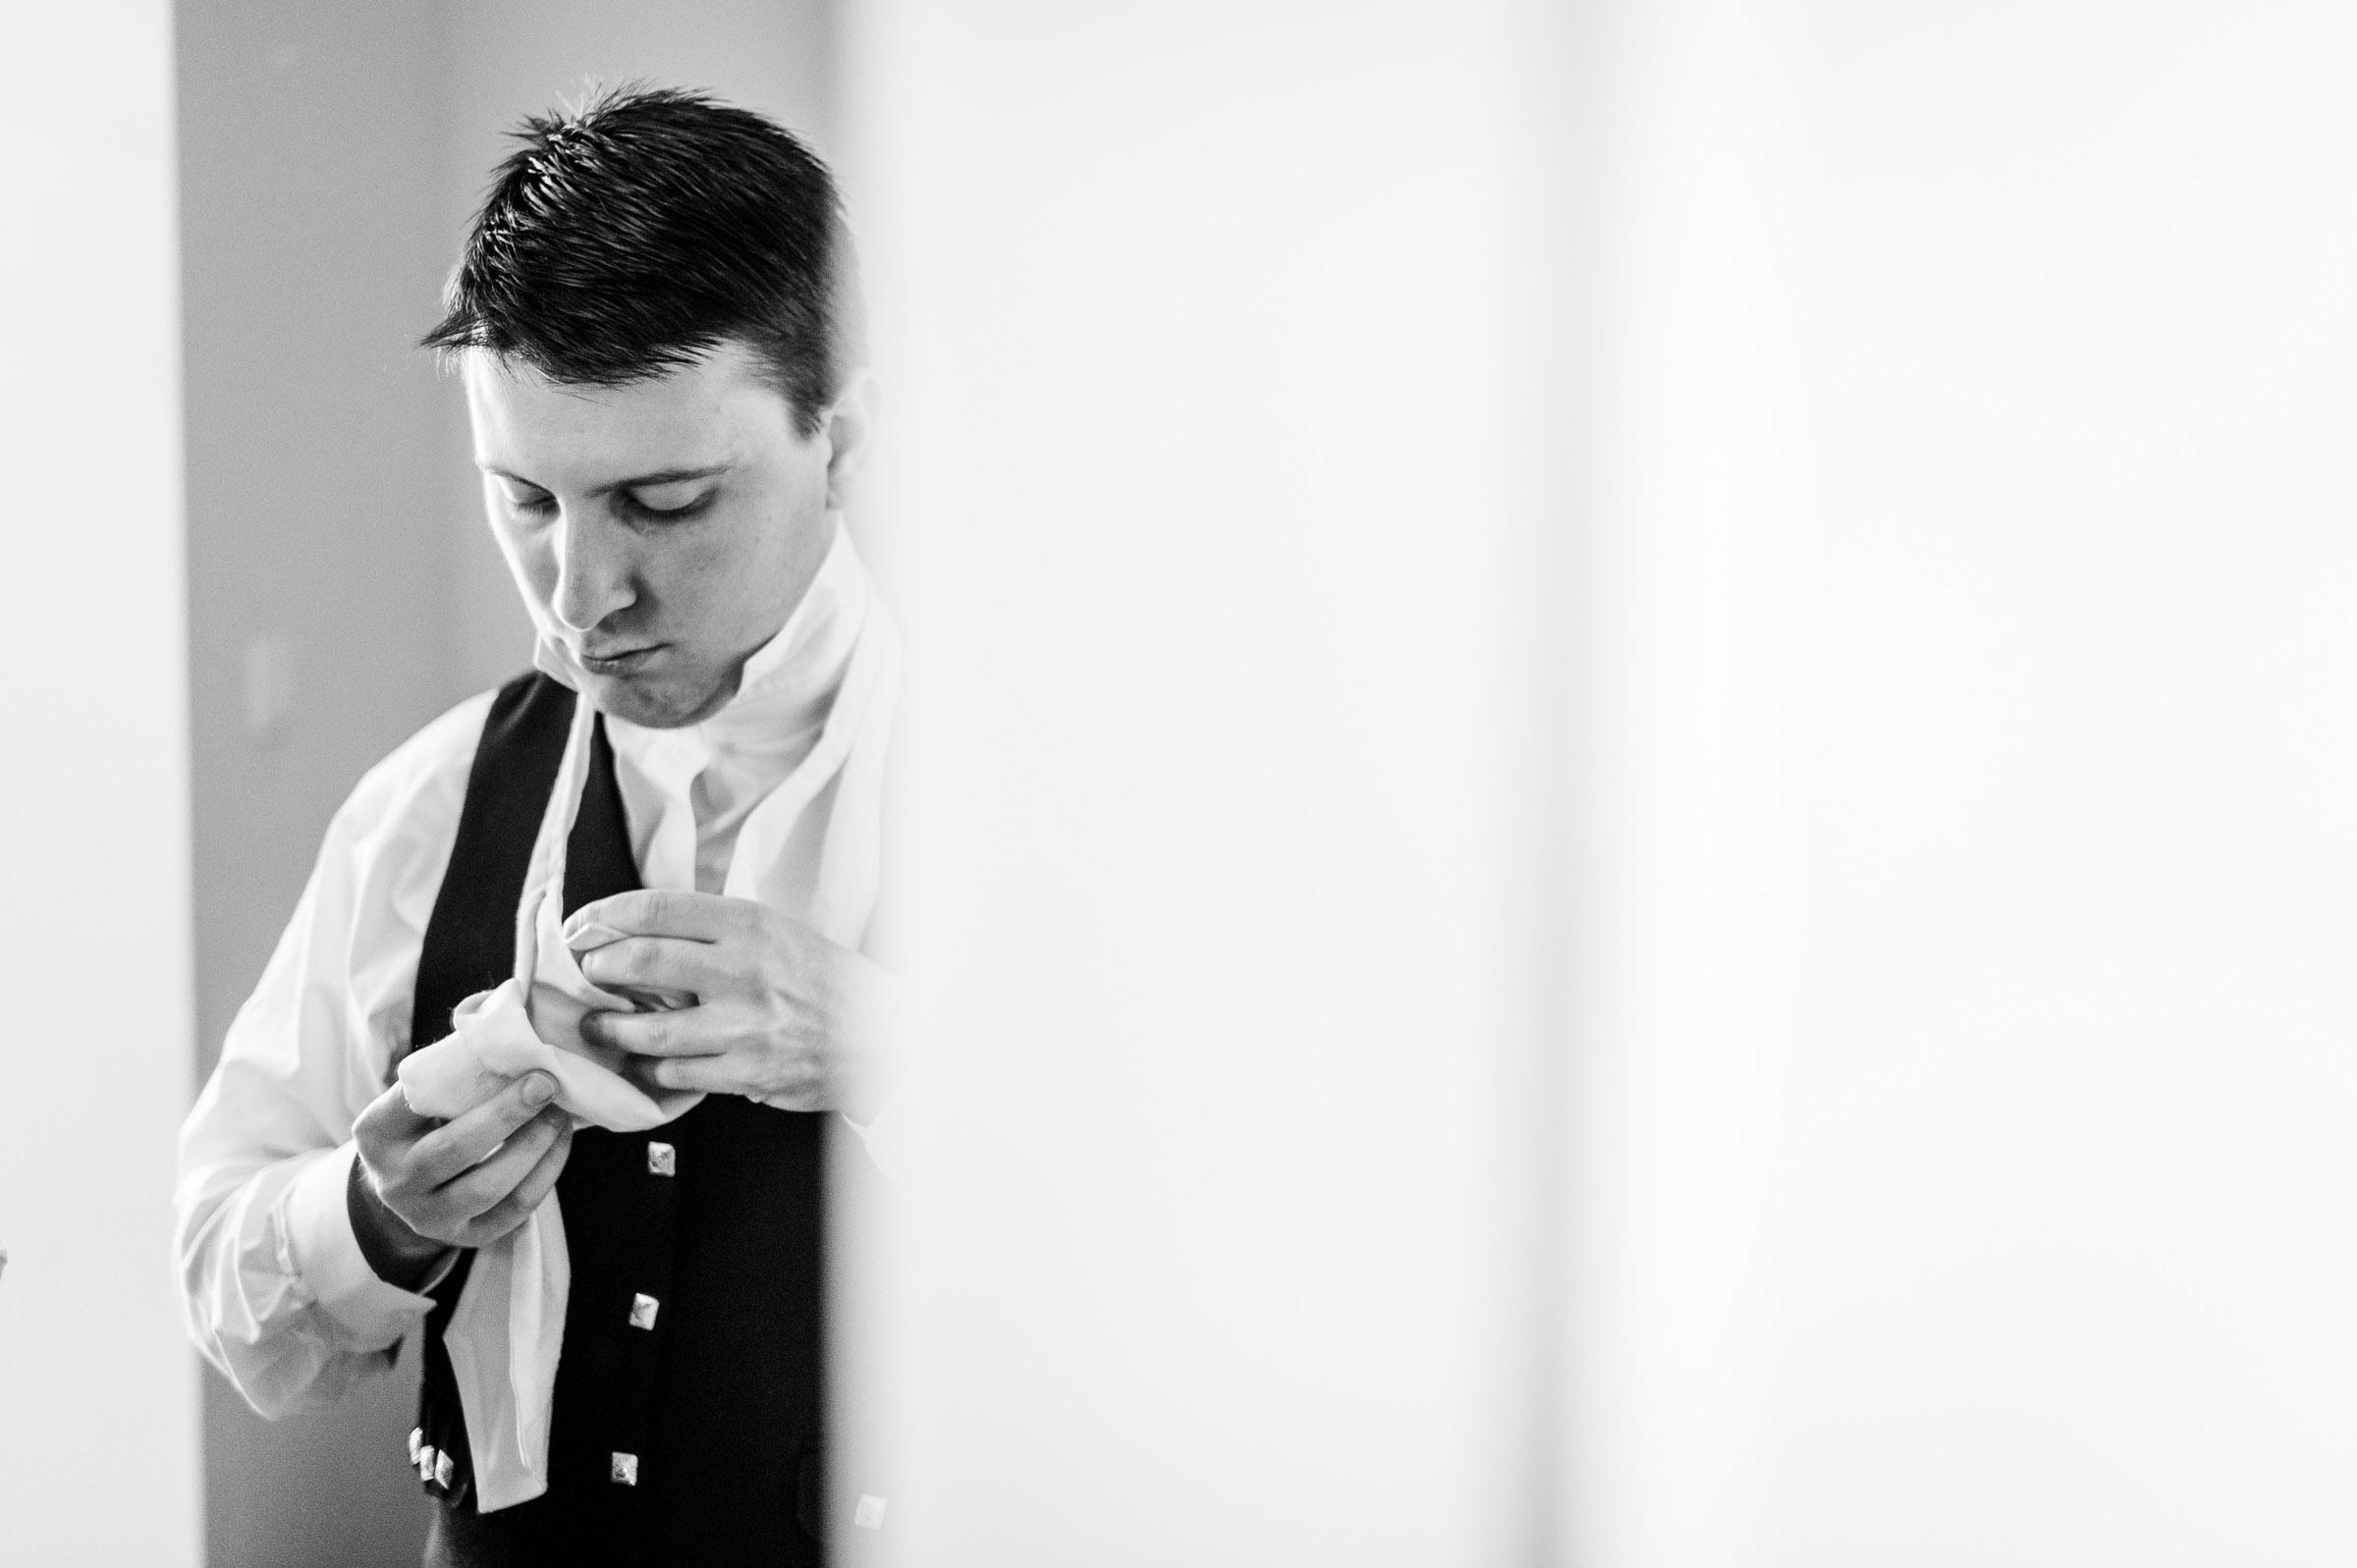 Ashmolean-Museum-Wedding-Pictures-0007.jpg